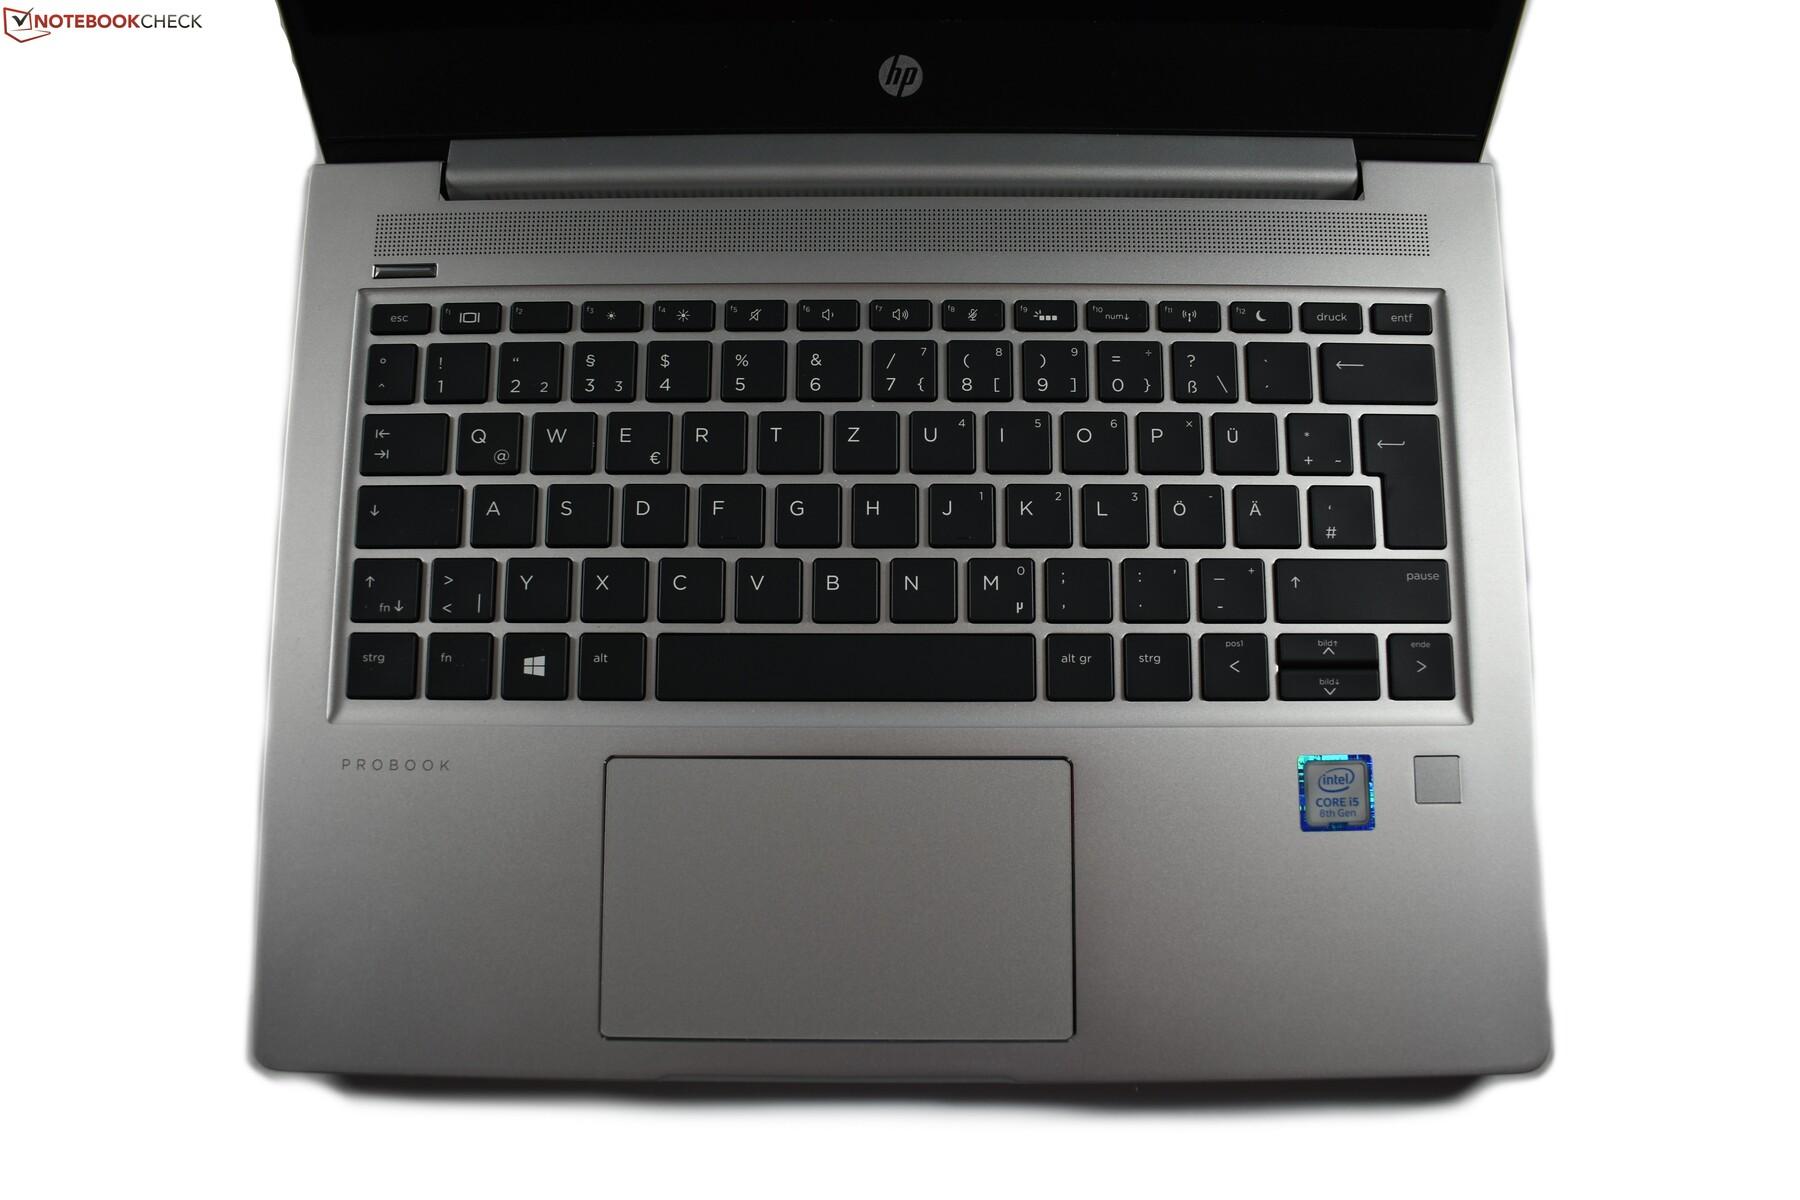 HP PROBOOK 430 G3 REALTEK CARD READER WINDOWS 8 DRIVER